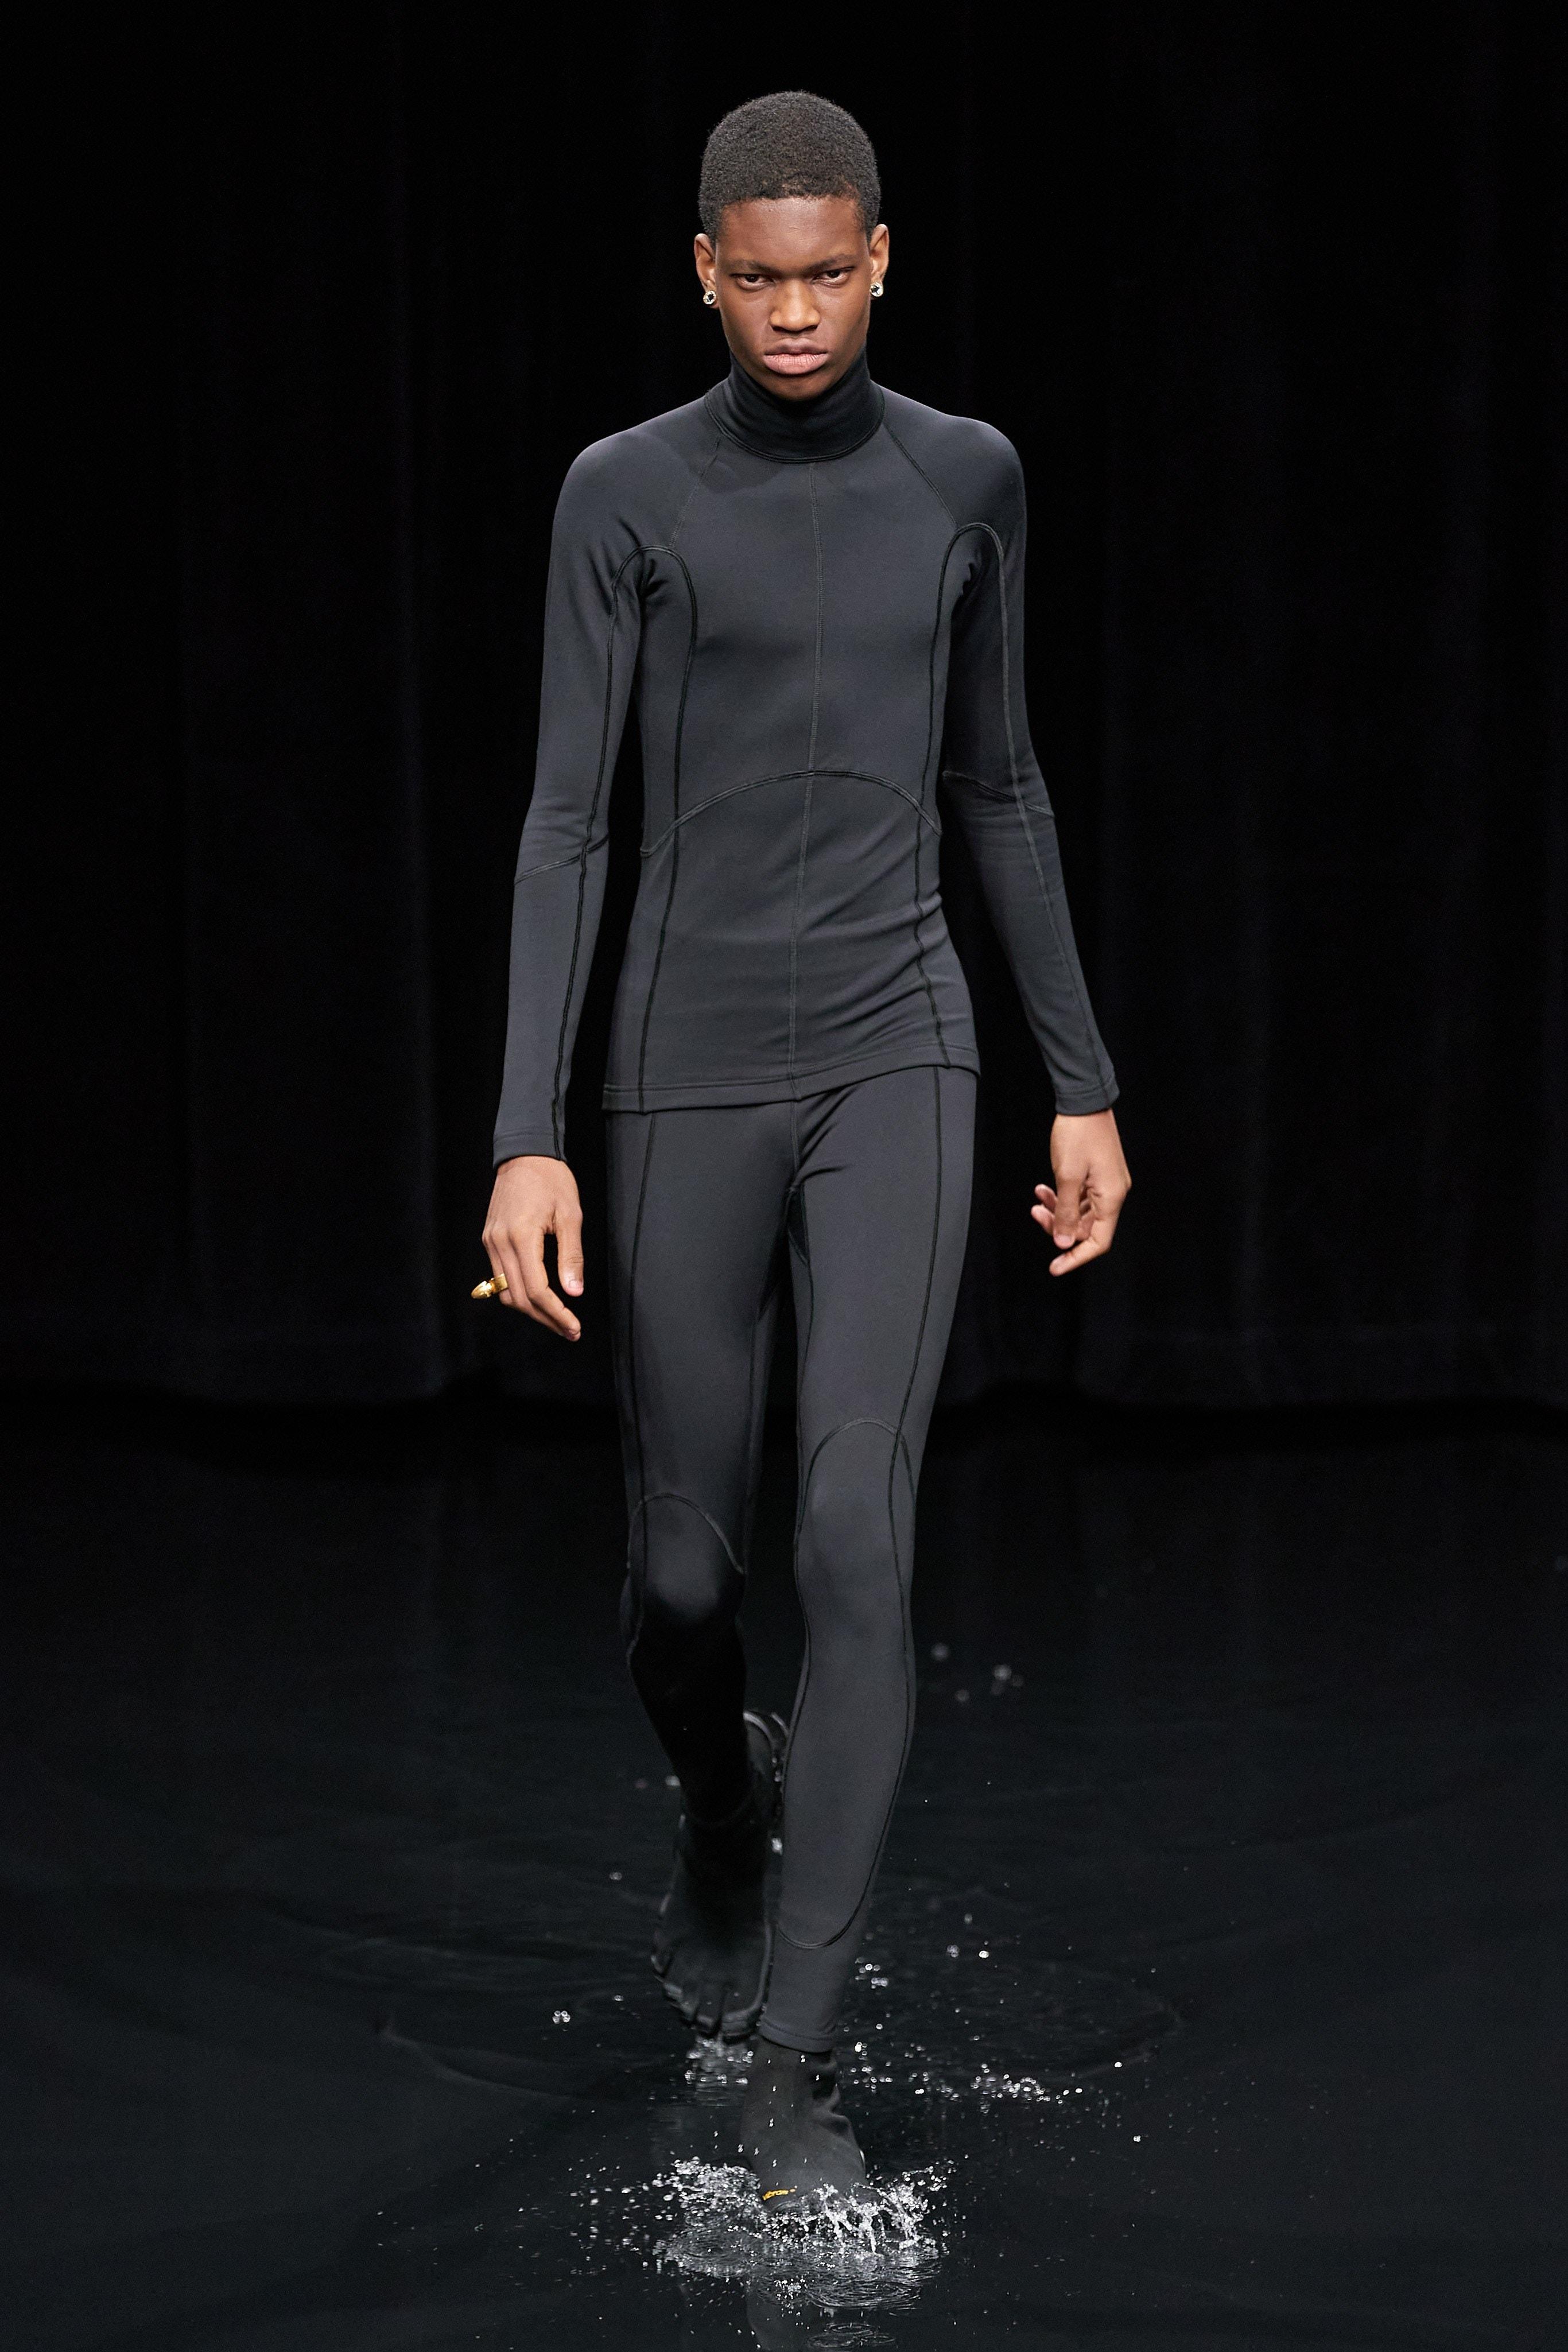 PFW Balenciaga 2020 FW Ready to Wear